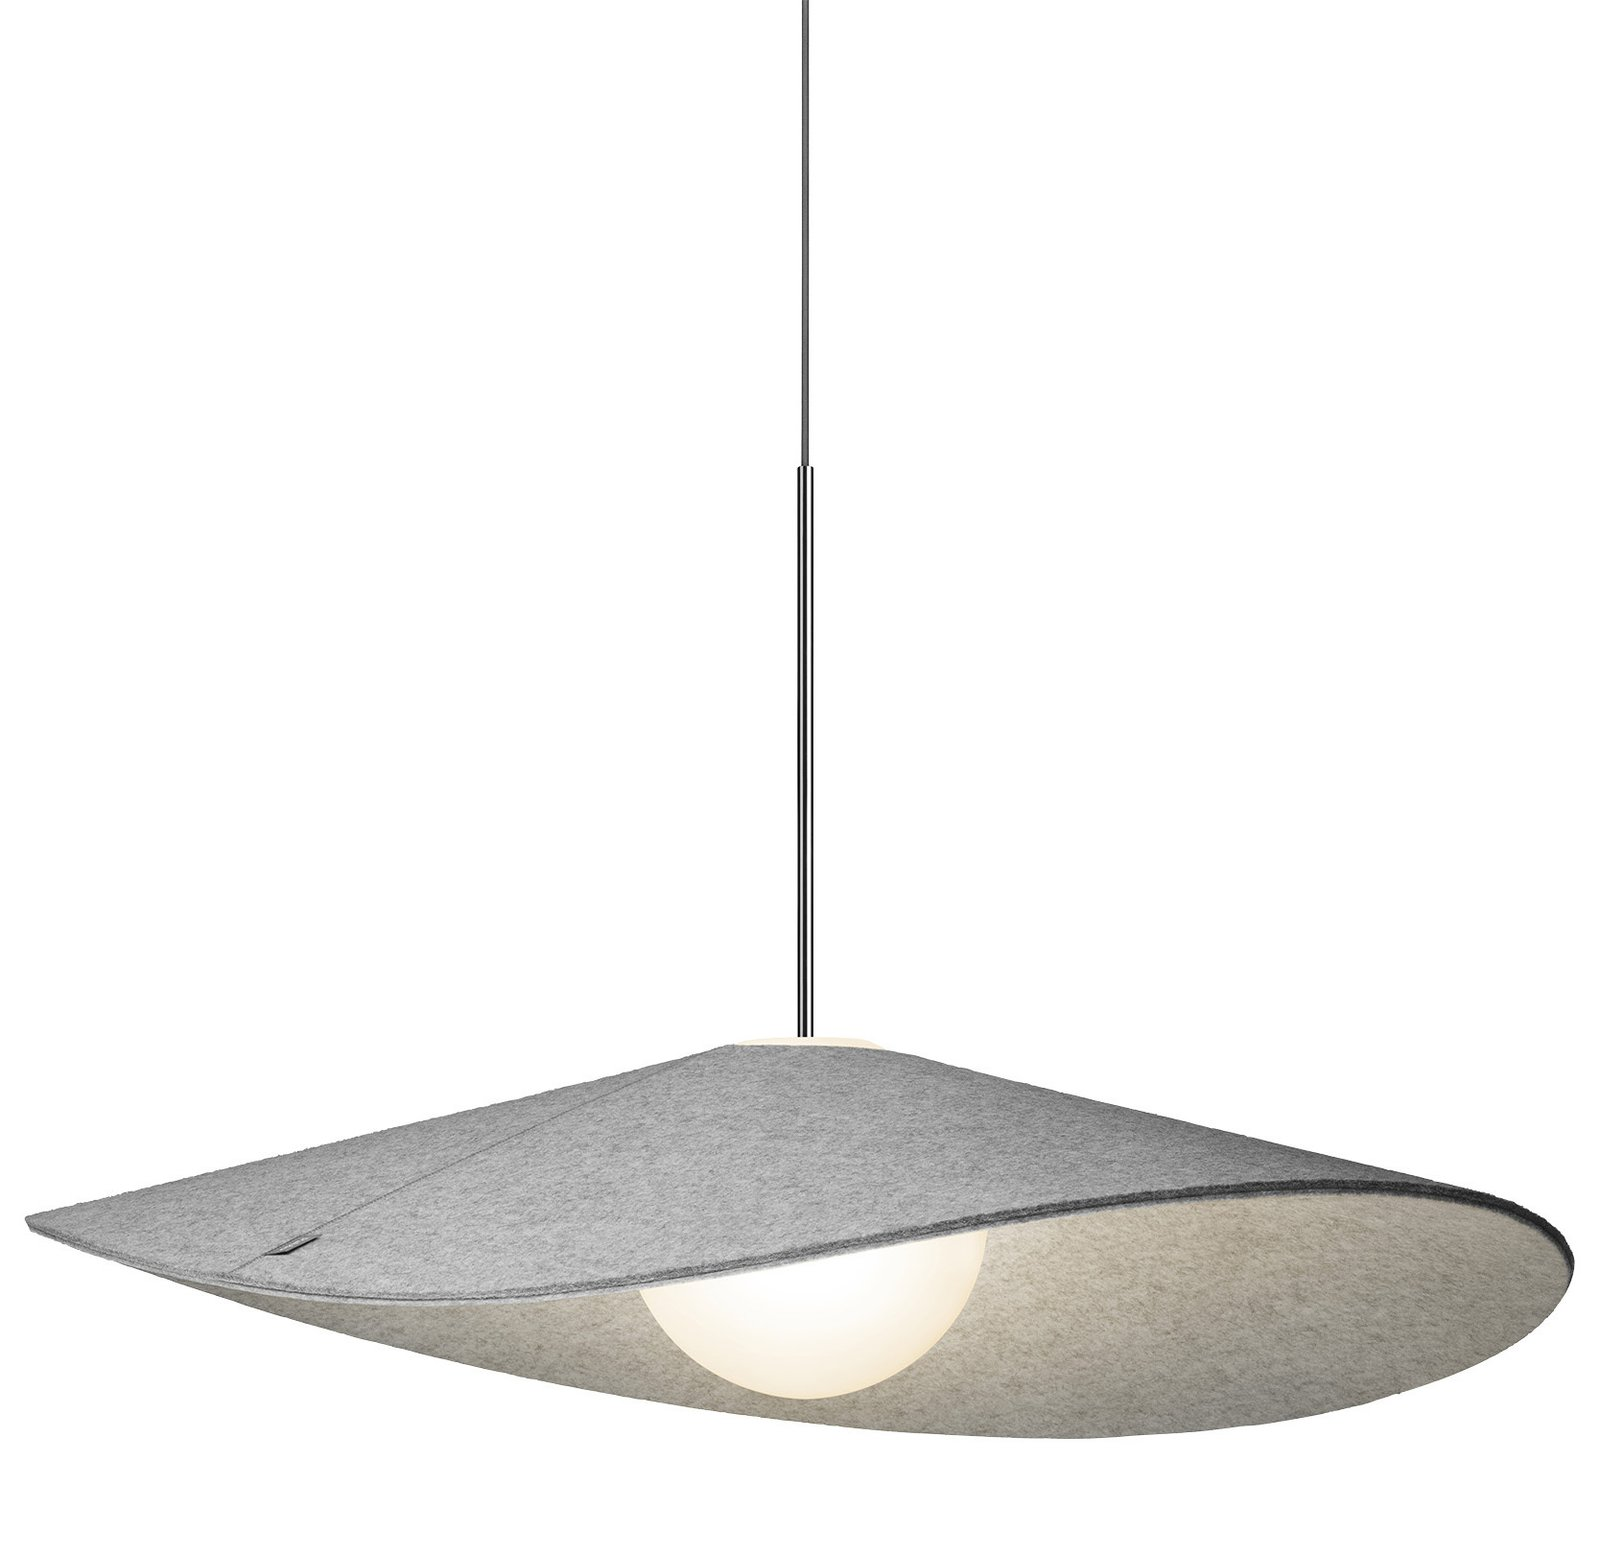 BolaFelt-Pendant-Lamp-Pablo-Designs